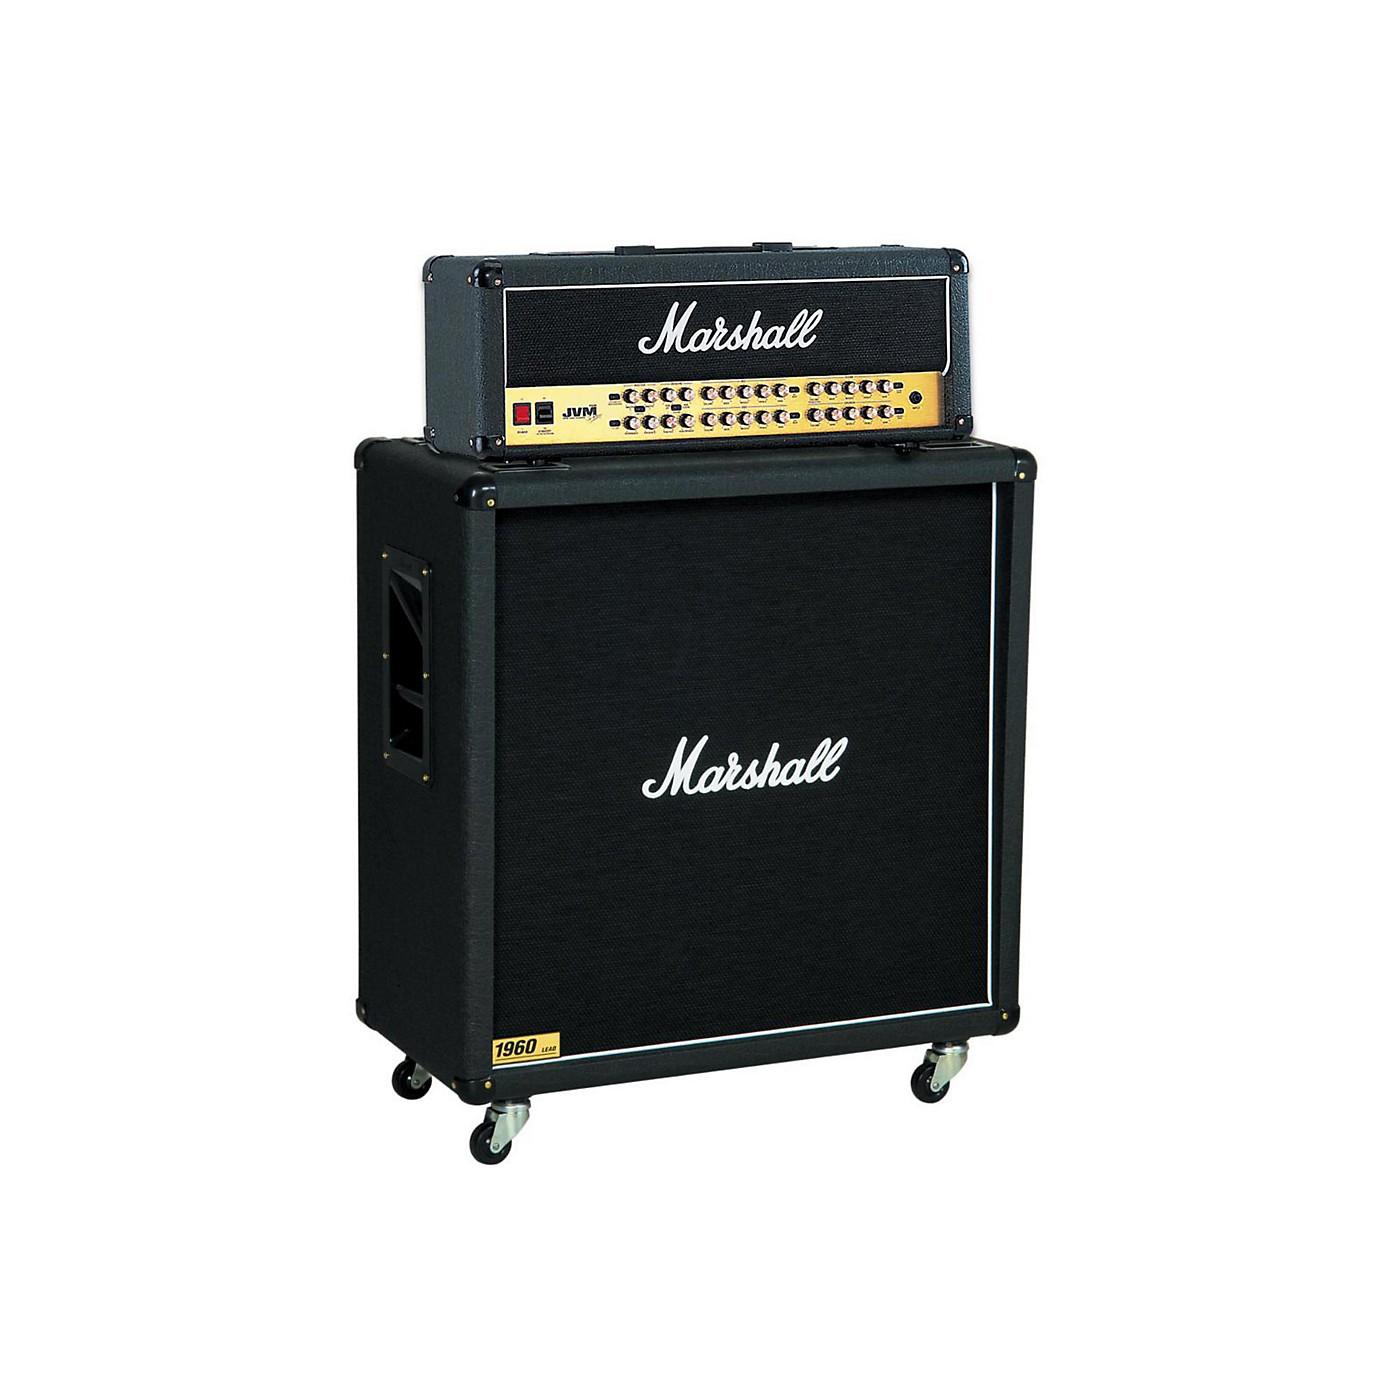 Marshall JVM Series JVM410H 100W Guitar Tube Head with 1960B 300W 4x12 Cab thumbnail